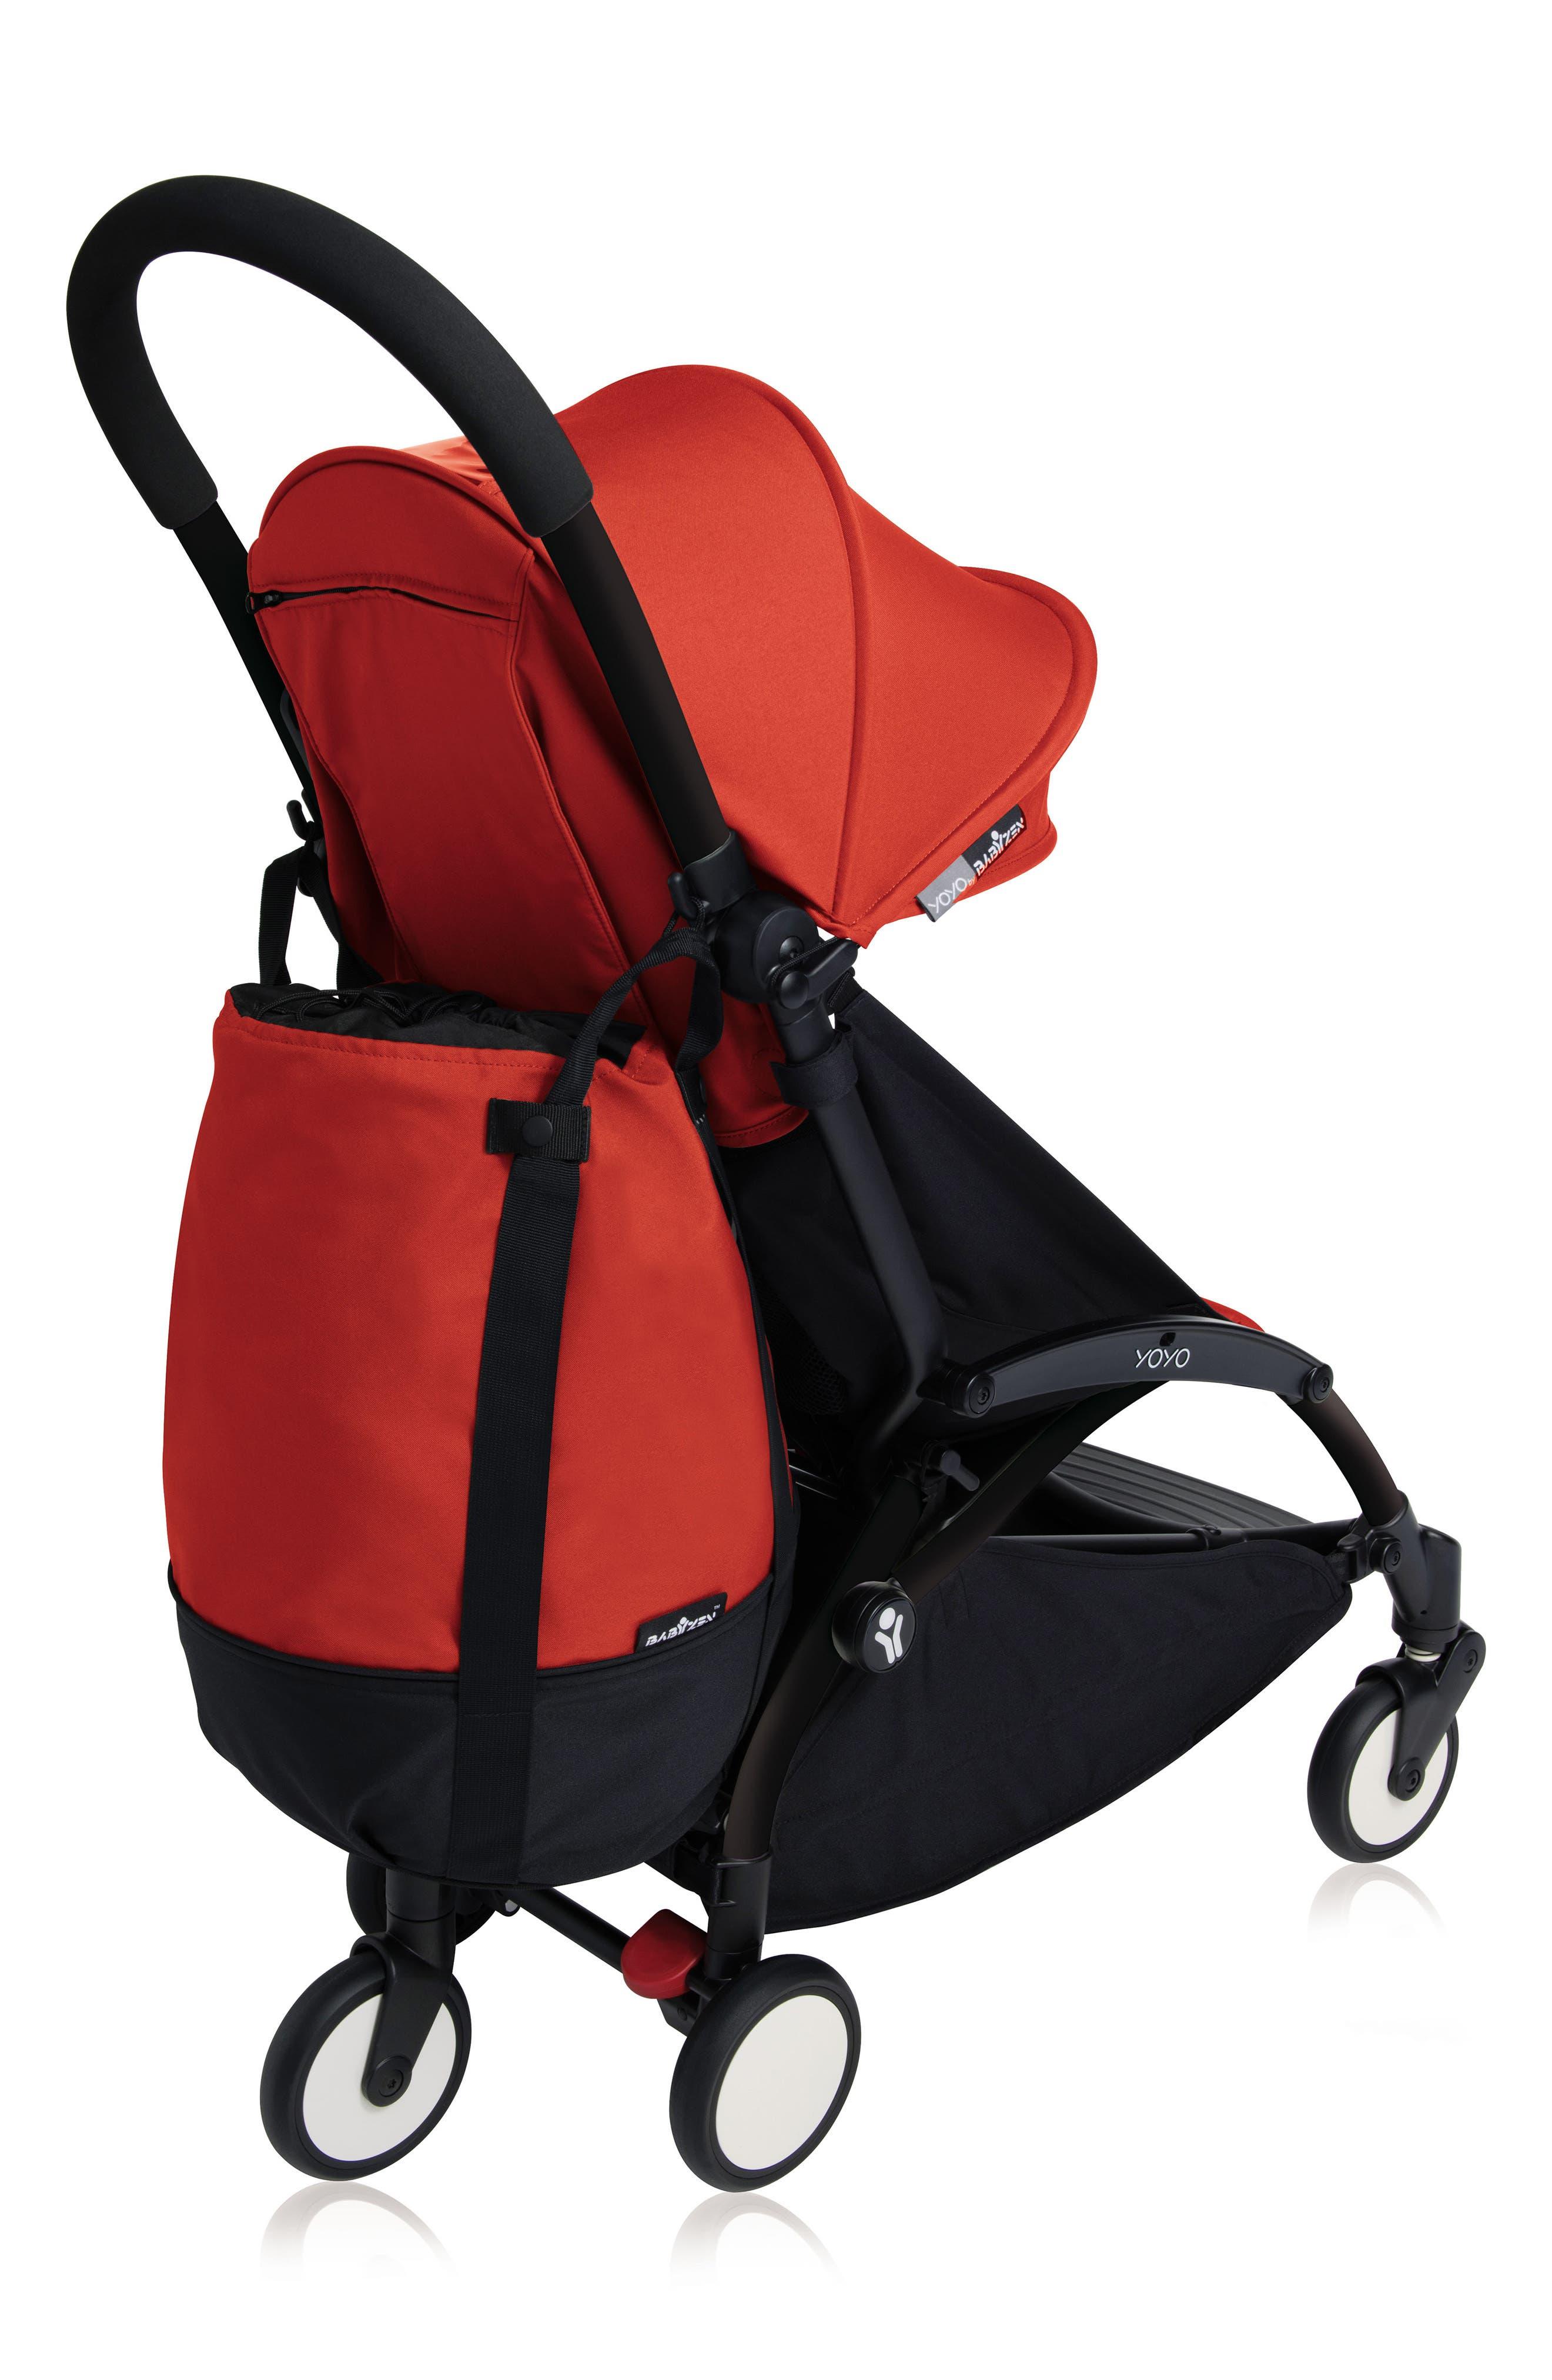 Infant Babyzen(TM) Yoyo Rolling Stroller Bag Size One Size  Red